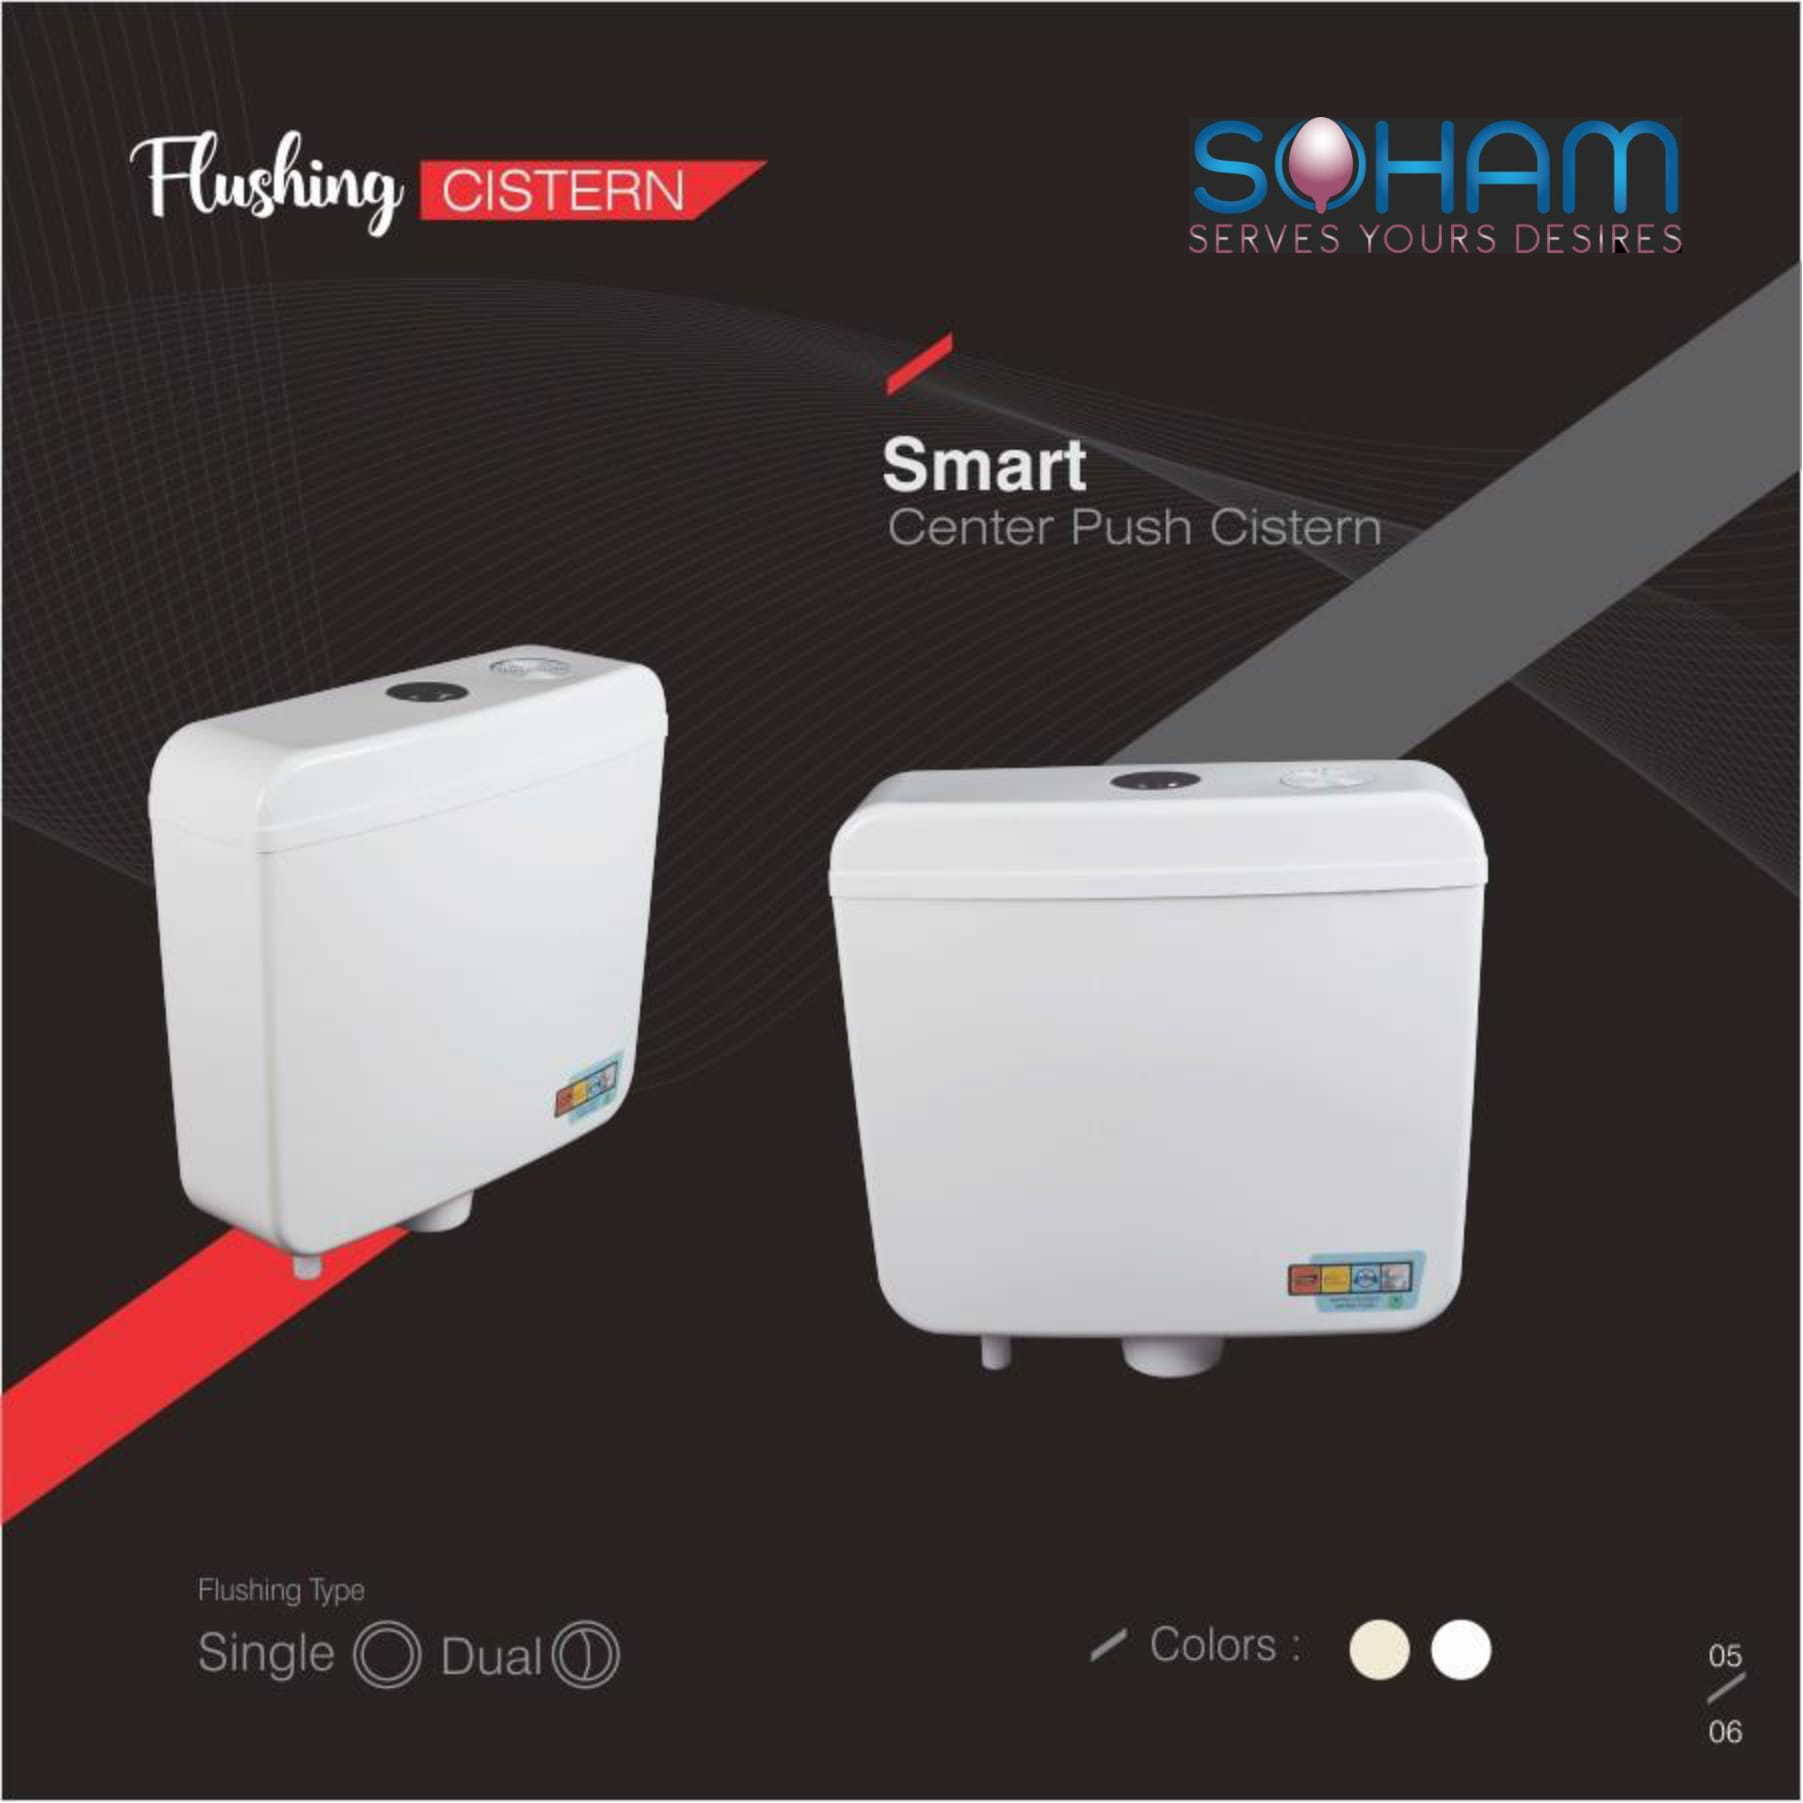 Smart Center Push Flushing Cistern